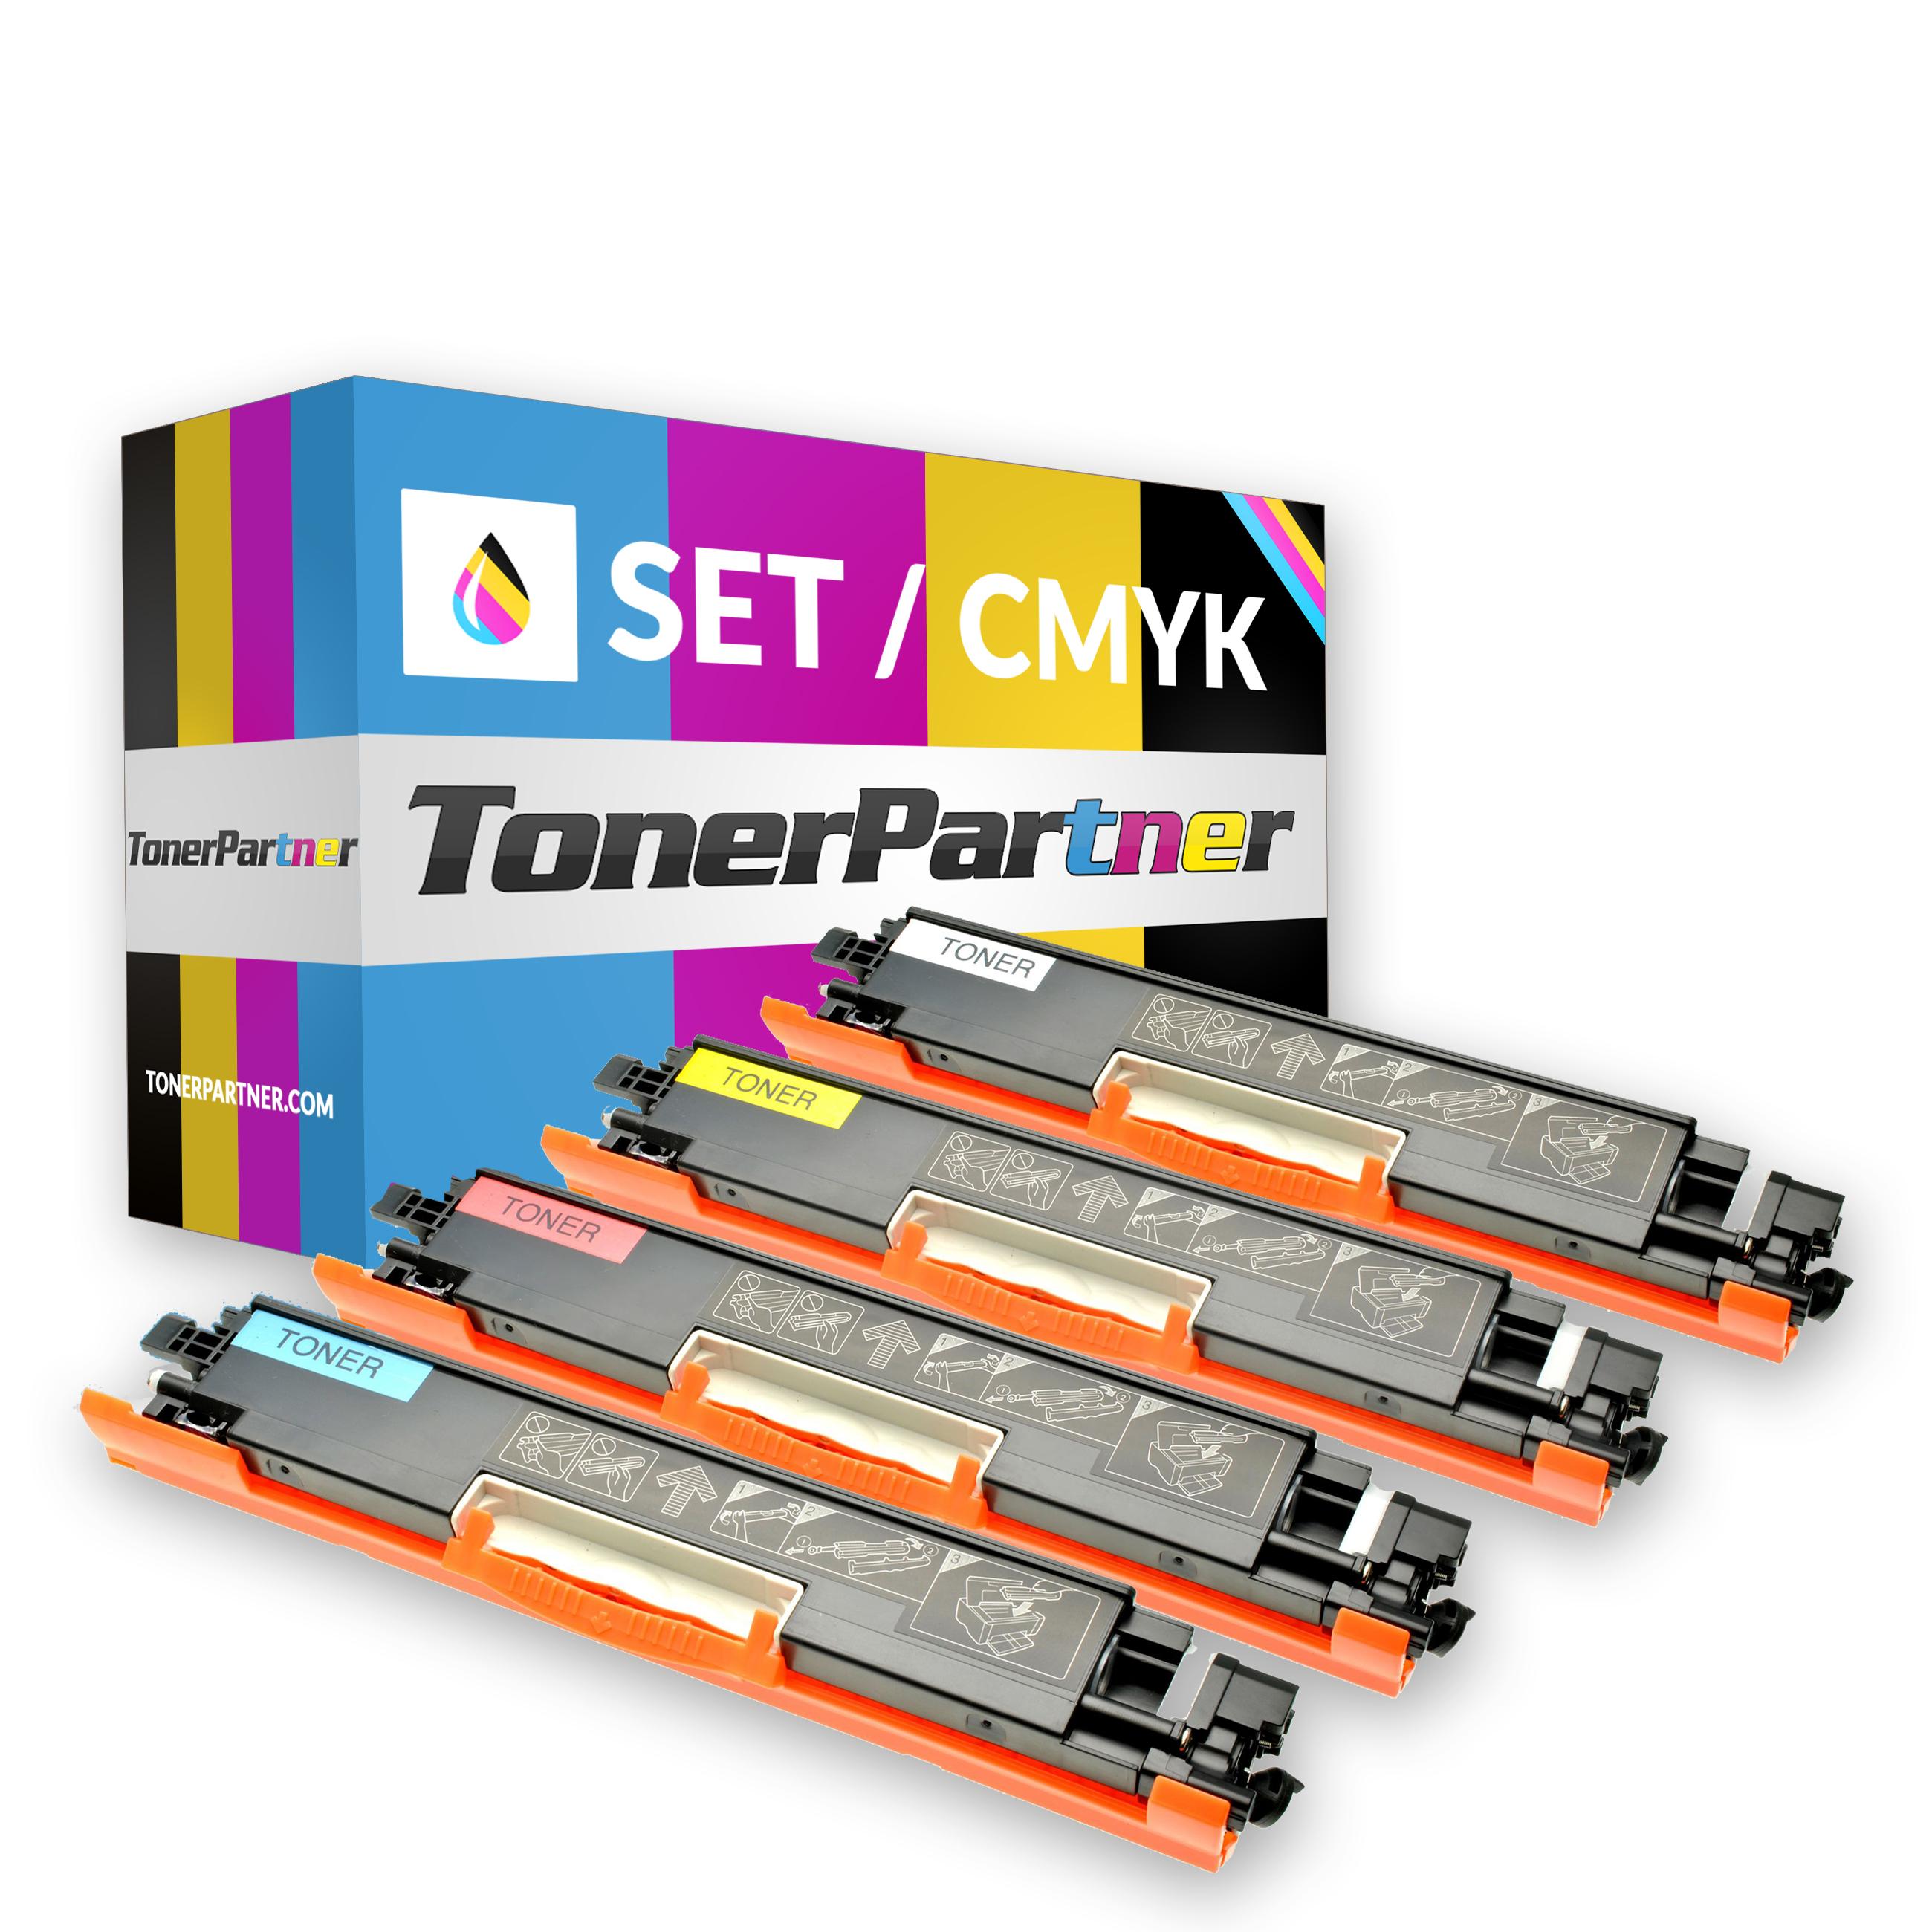 HP CE310A (1x 1.200 Seiten) - CE311A/CE312A/CE313A (3x 1.000 Seiten) Toner MultiPack Kompatibel